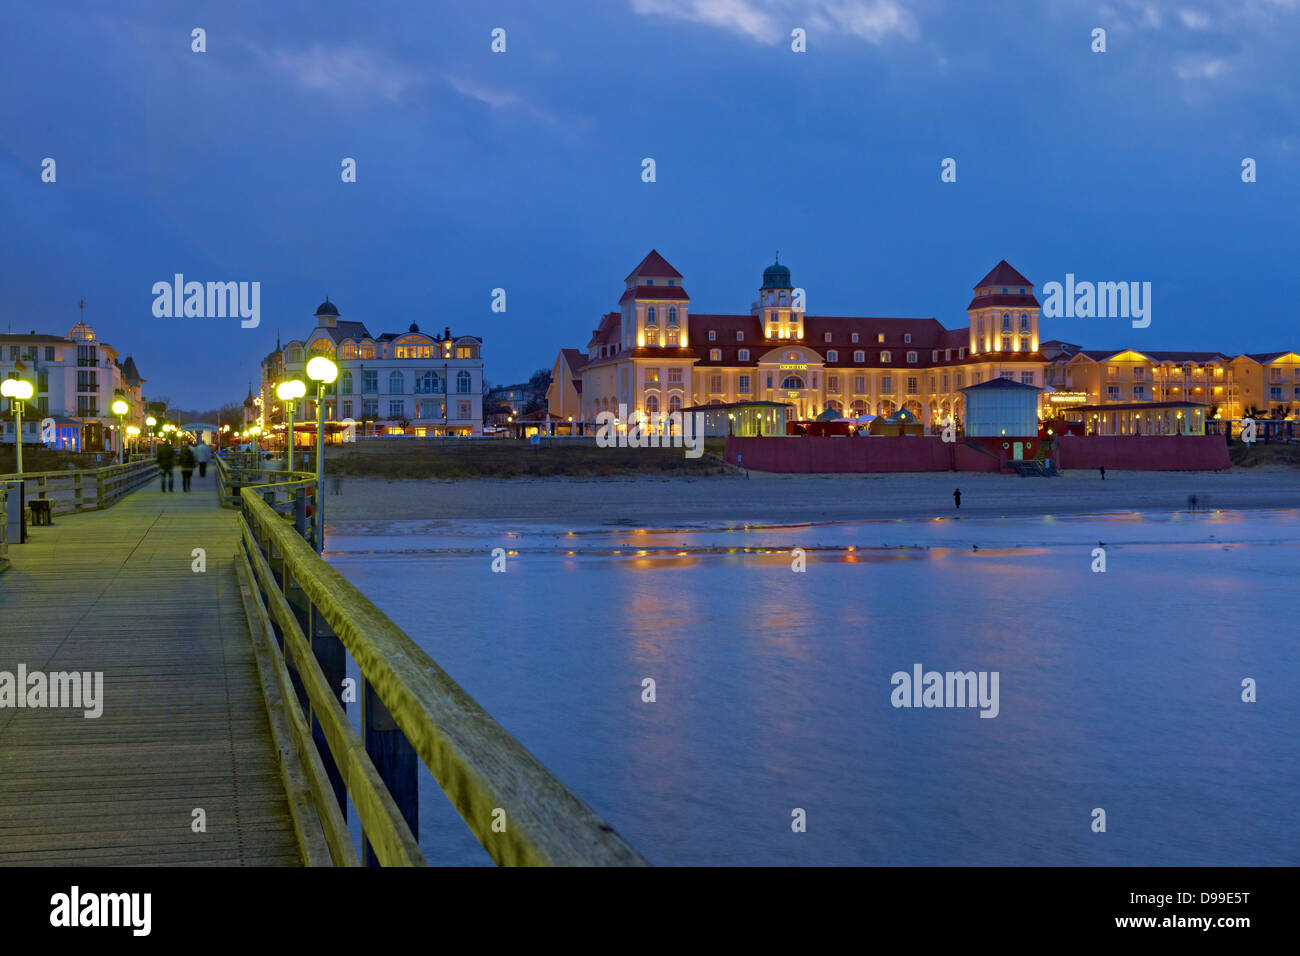 Kurhaus with pier in Binz, Ruegen Island, Mecklenburg-Western Pomerania, Germany Stock Photo